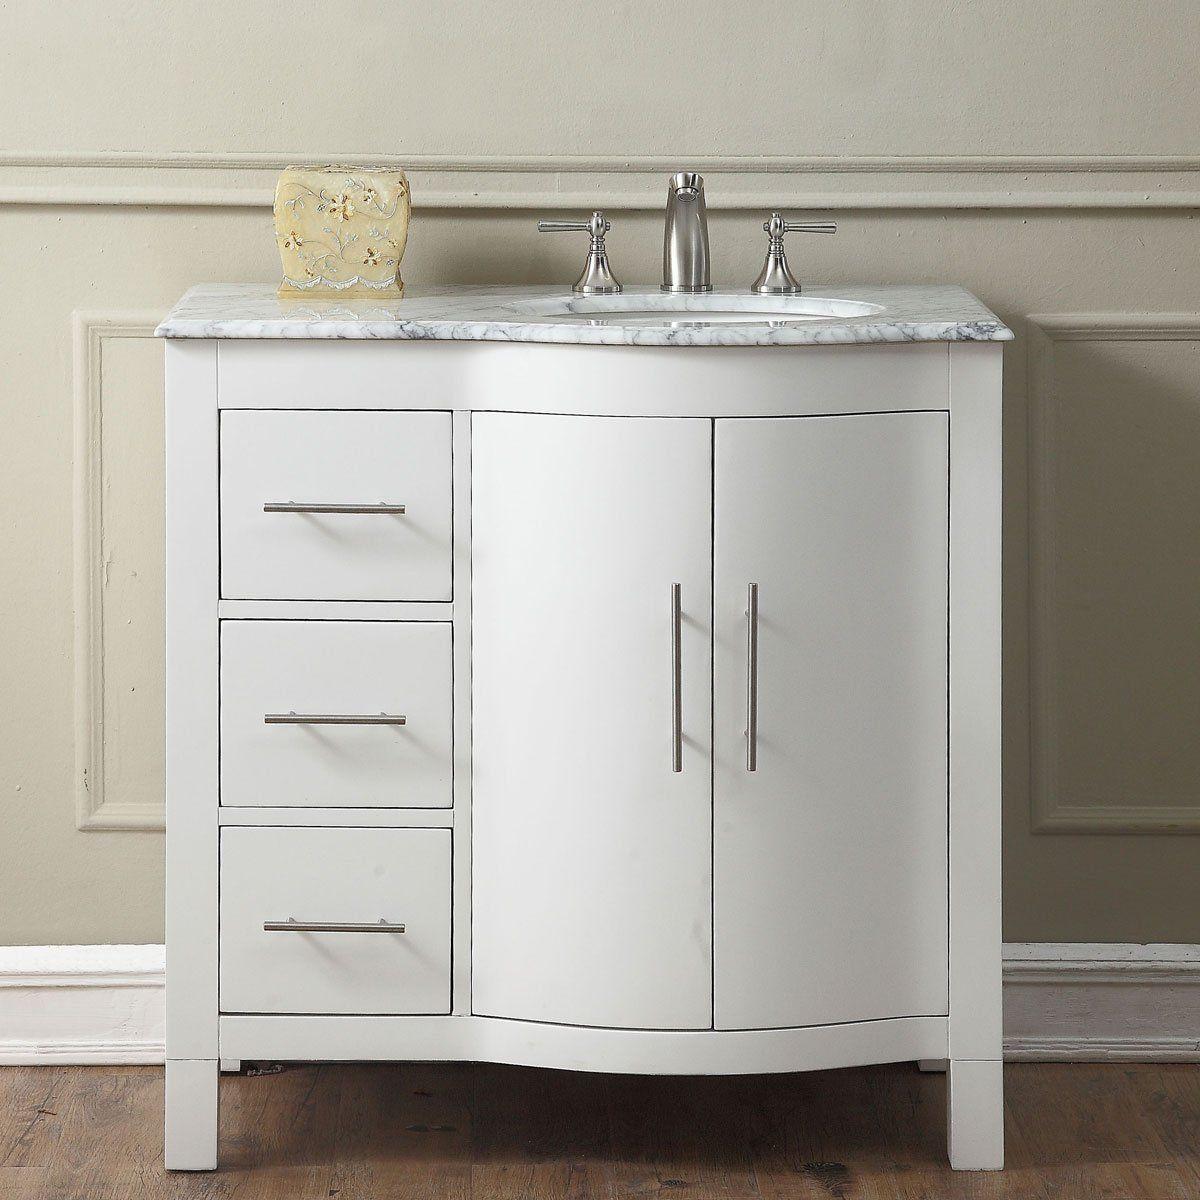 36 inch Single Sink Bathroom Vanity Cabinet White Finish, Carrara ...